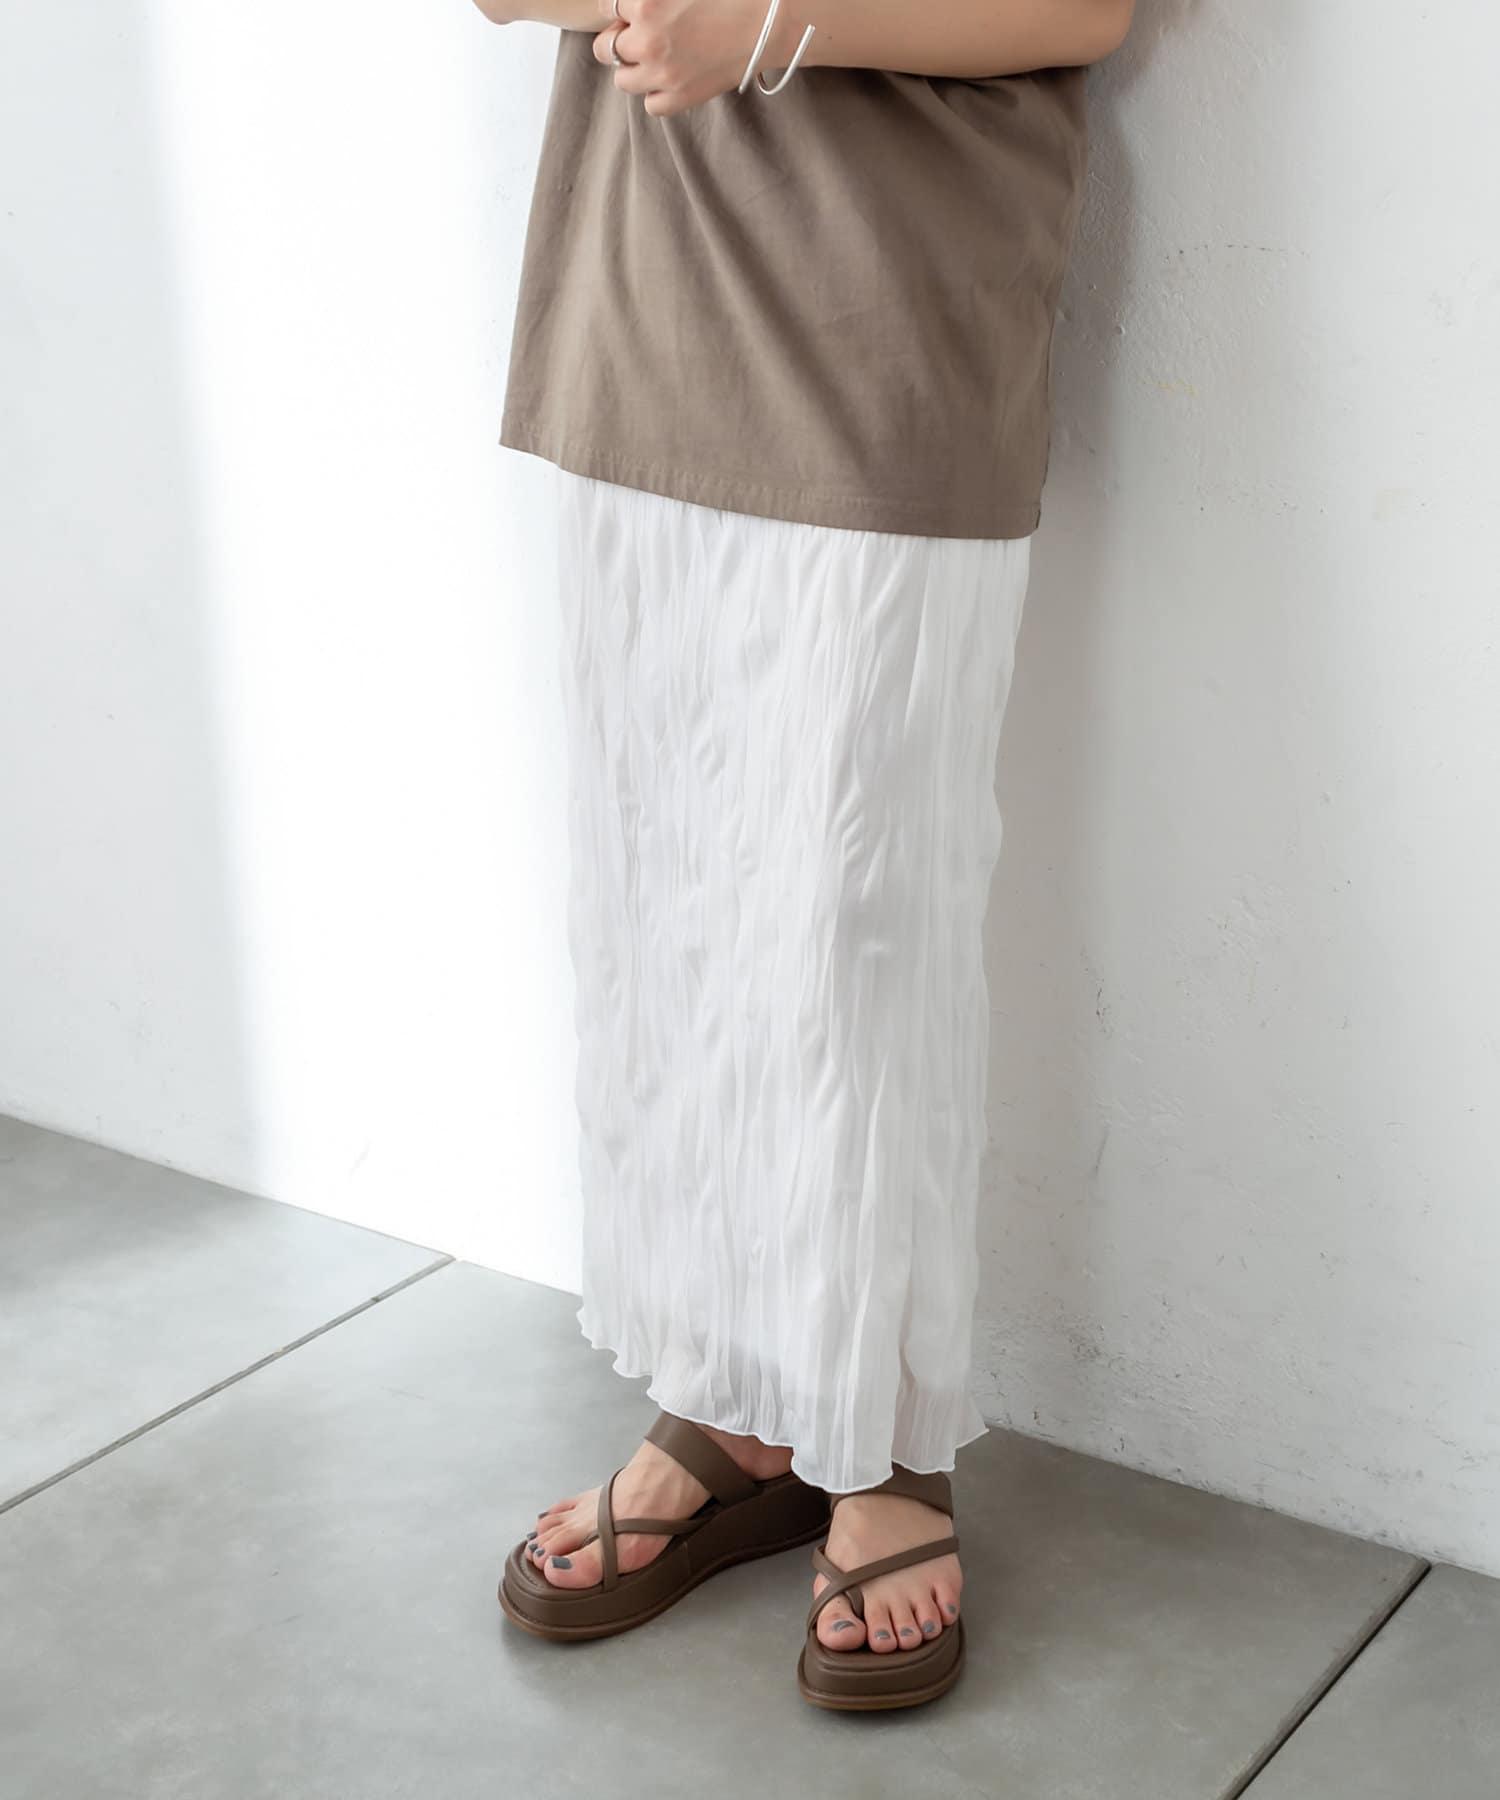 mystic(ミスティック) レディース シアー楊柳スカート オフホワイト